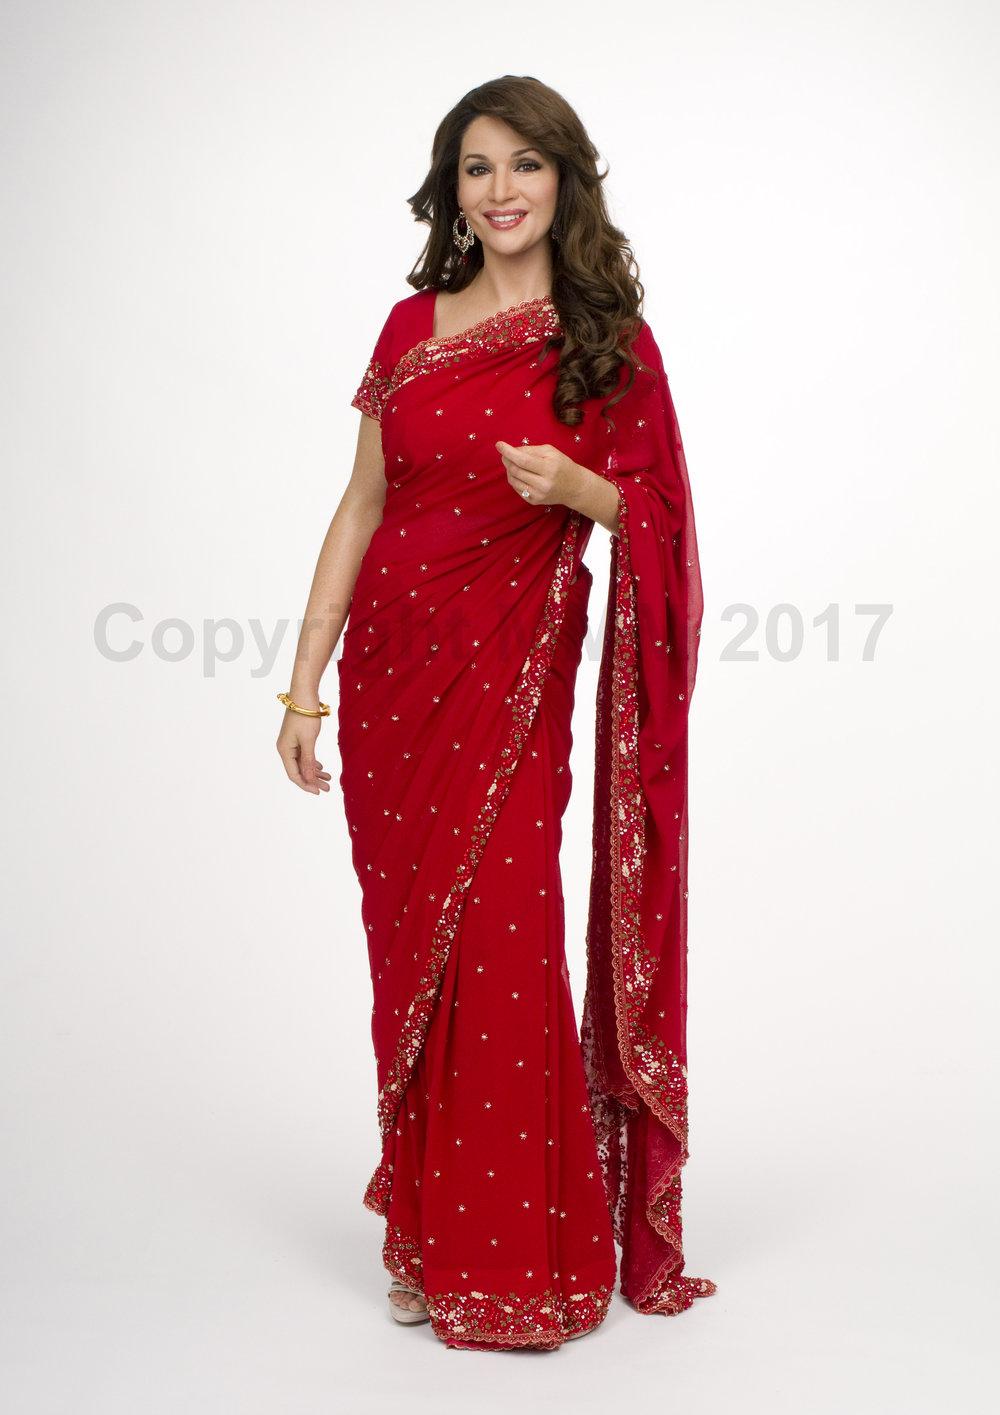 _DSC9907 Madhuri Dixit - Nene MTL 2012 .jpg